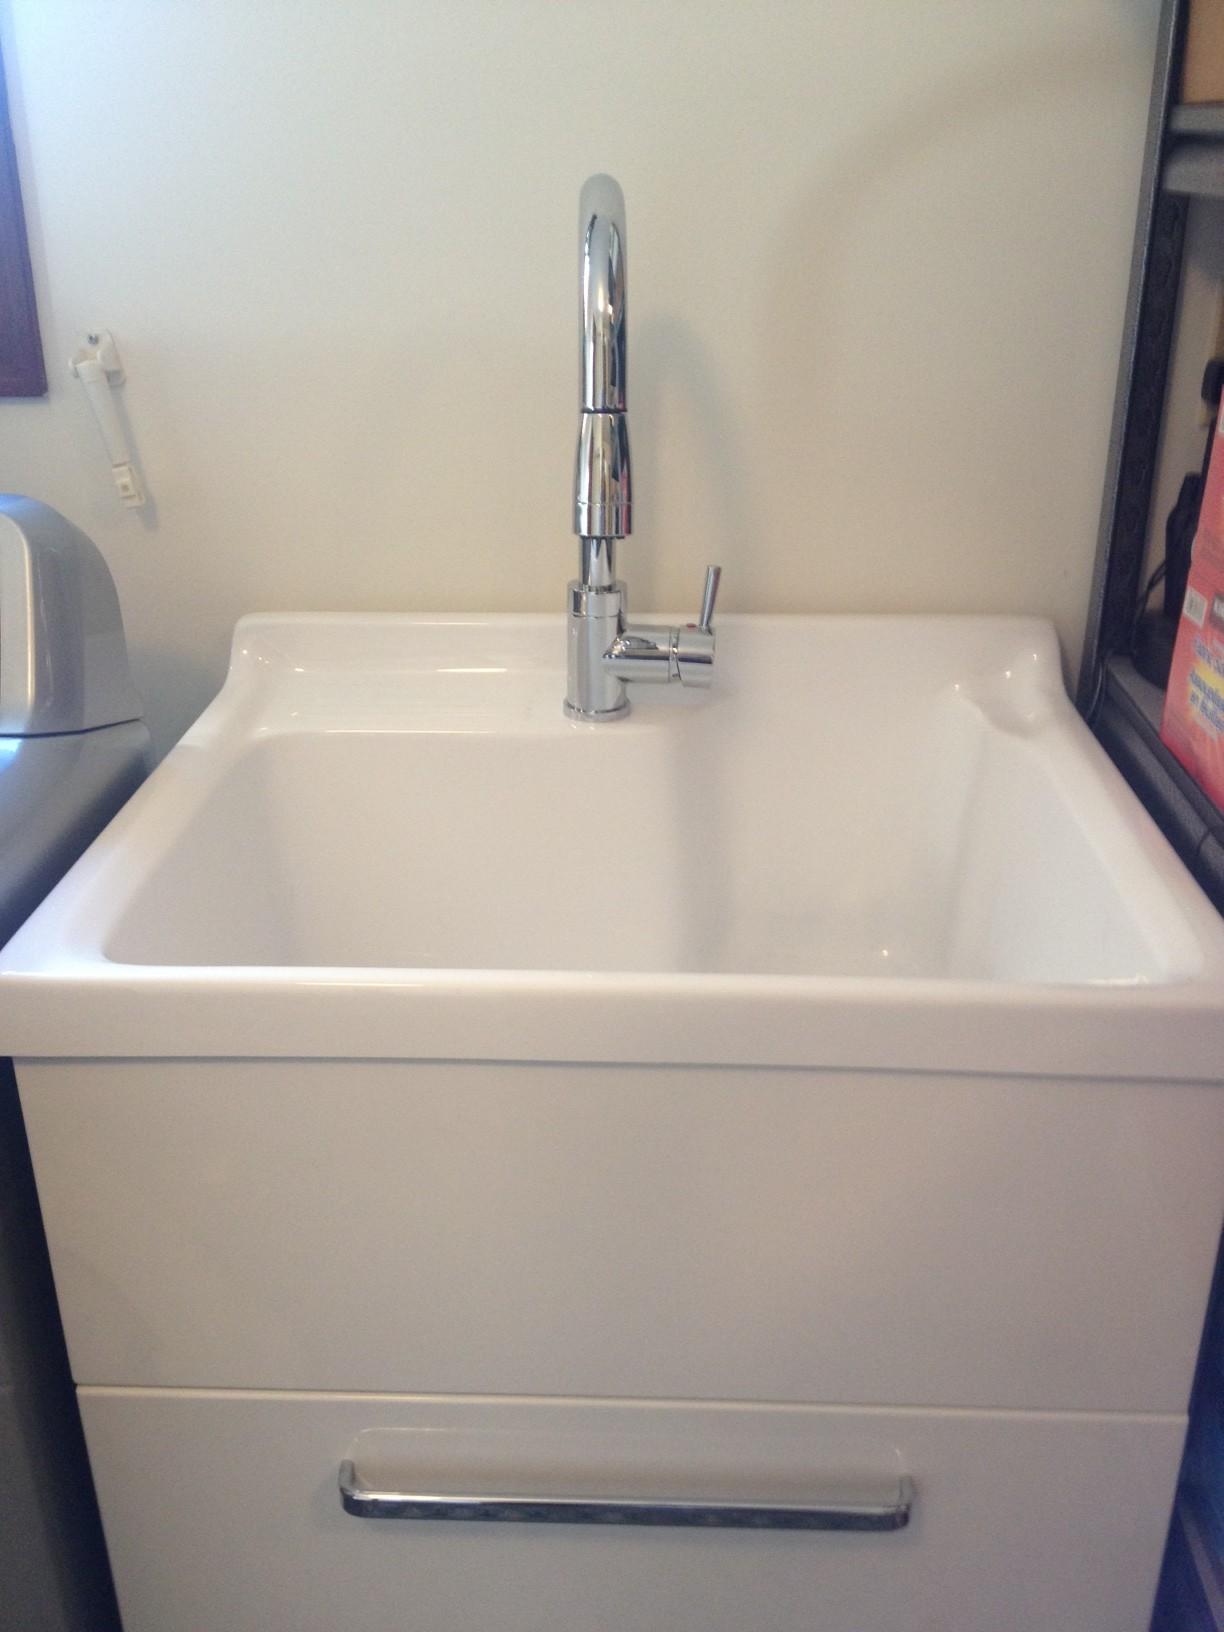 Plumbing Installation Victoria Bathroom Fixture Laundry